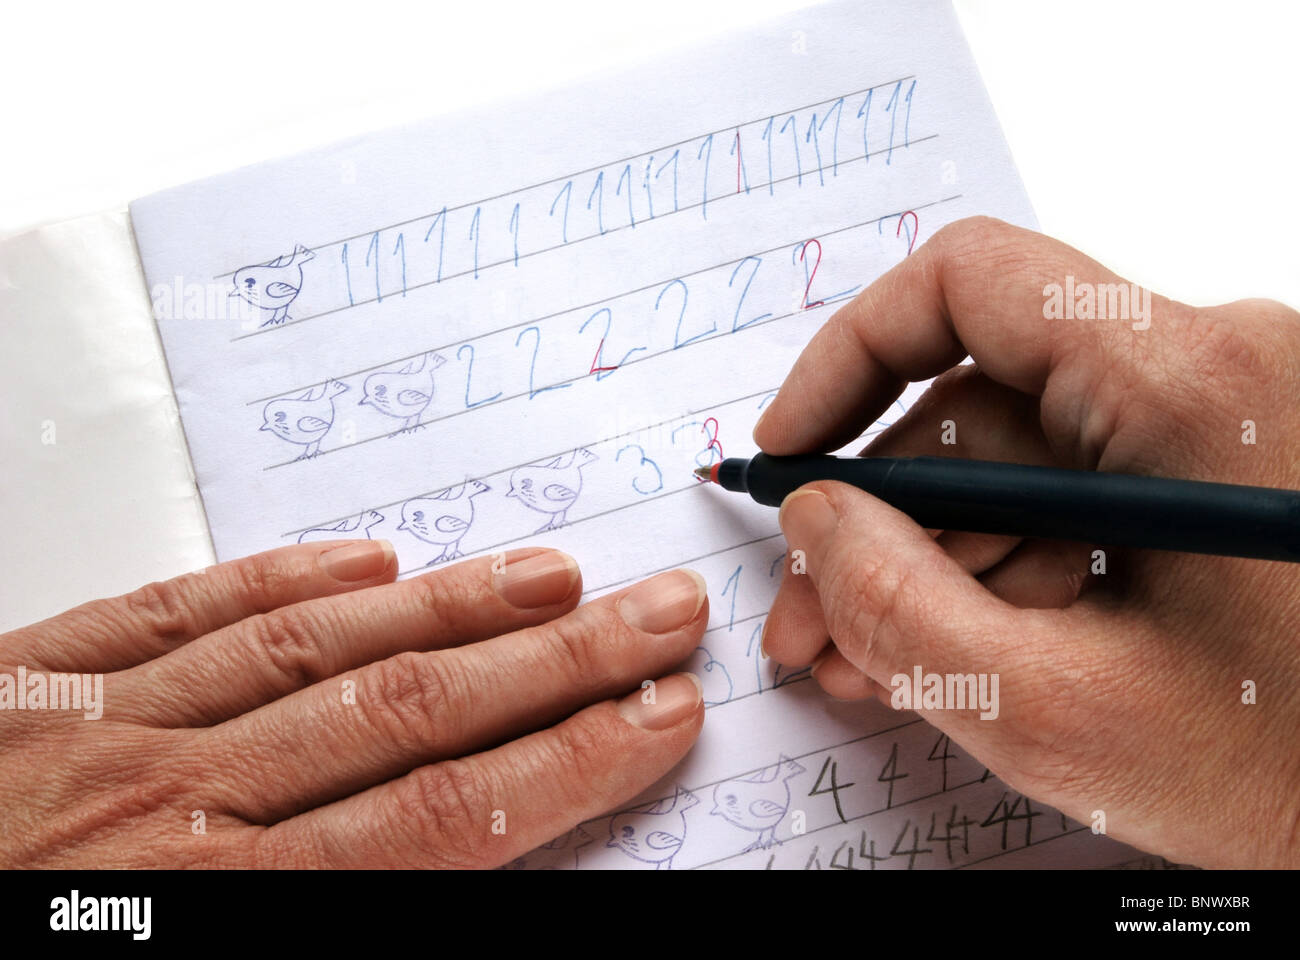 Teacher´s hand with red pen revising school homework - Stock Image